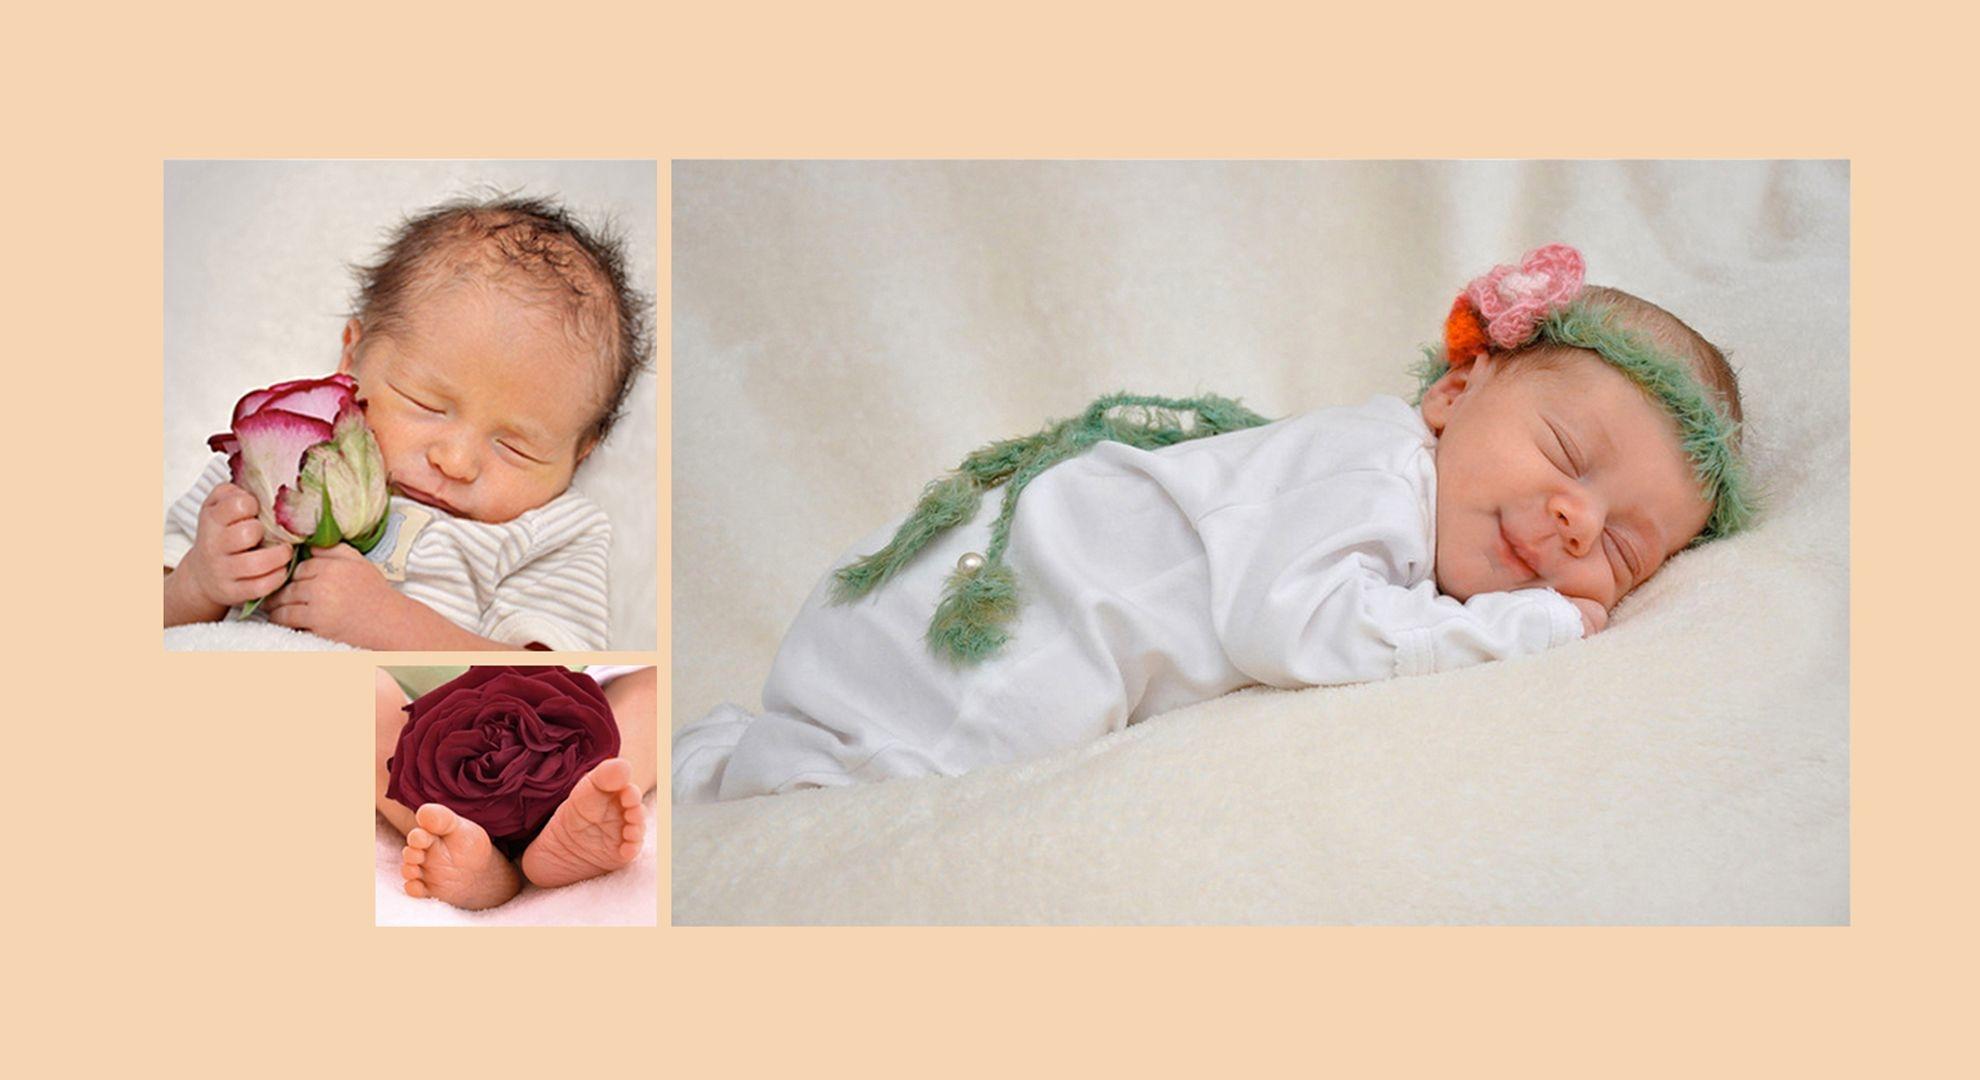 Neugeborenenfotografie  mobil in Wuppertal  Babyfotos